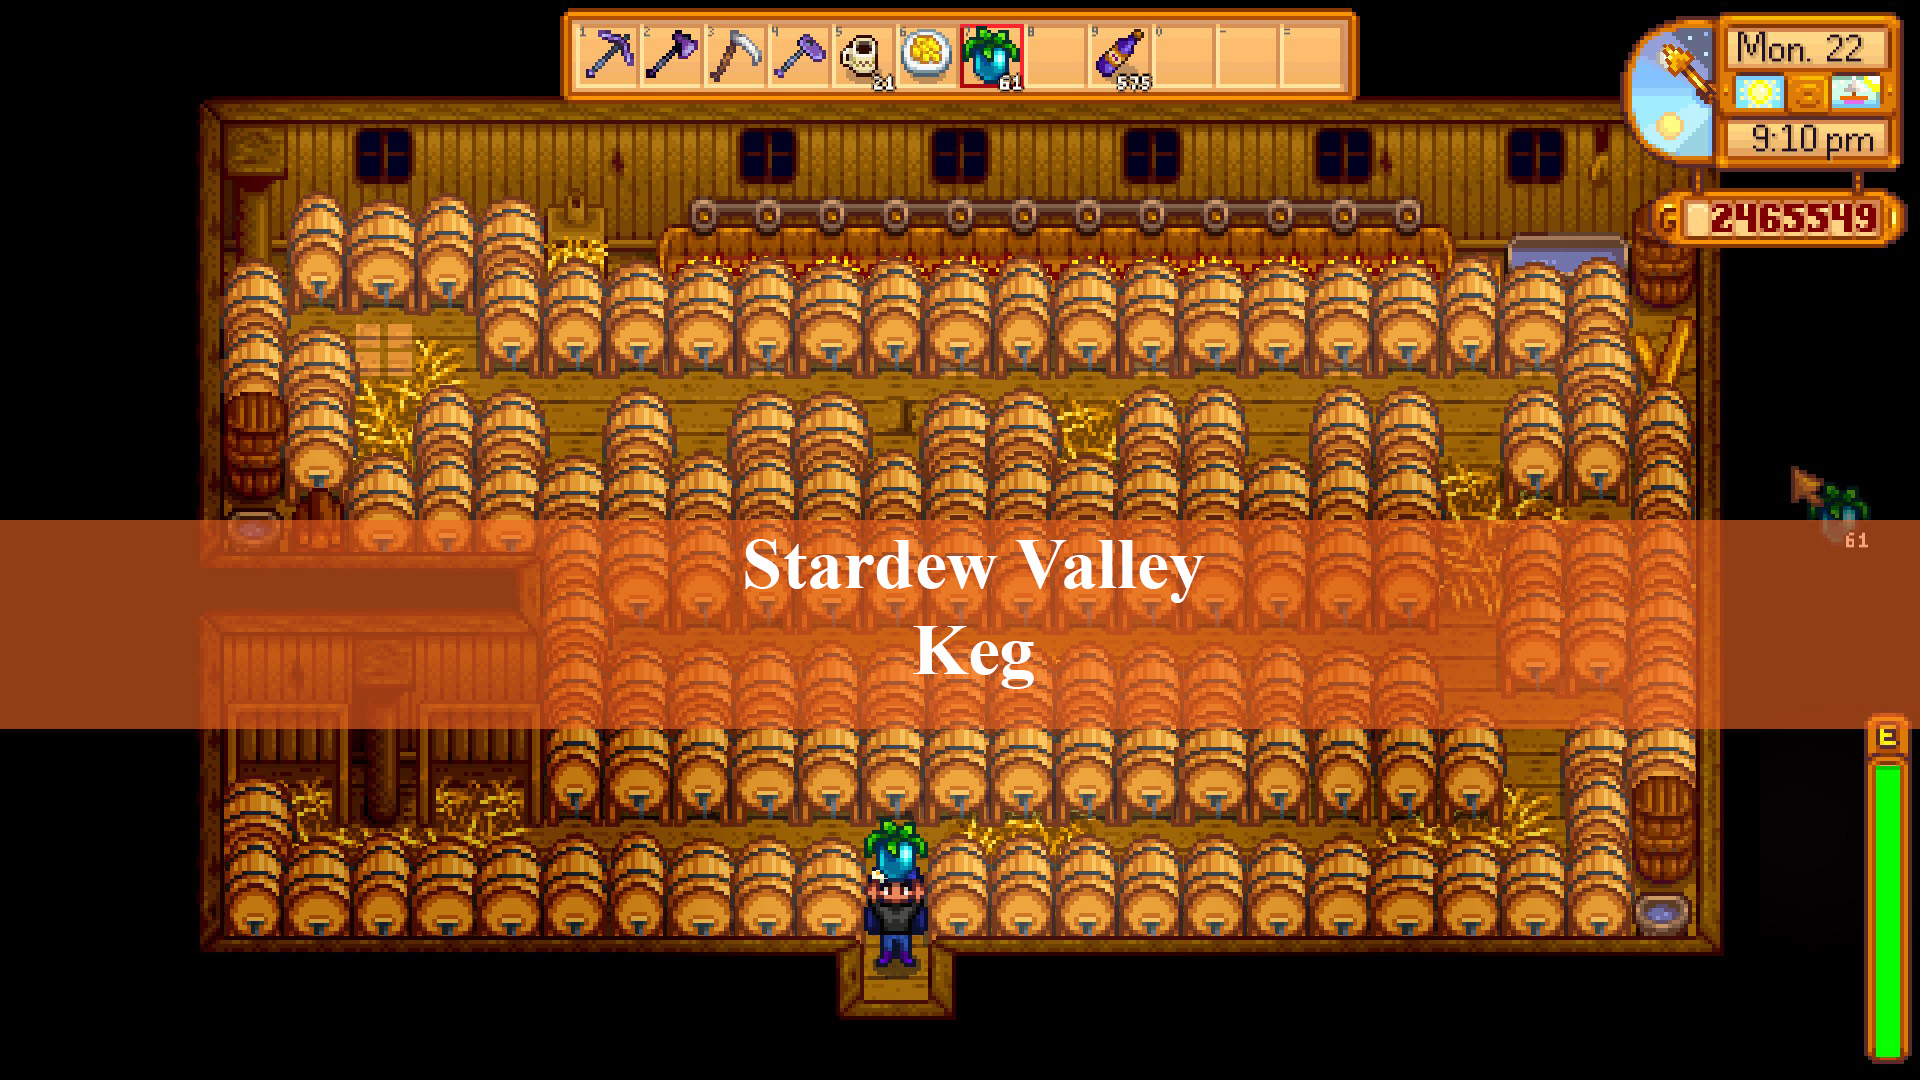 stardew valley keg